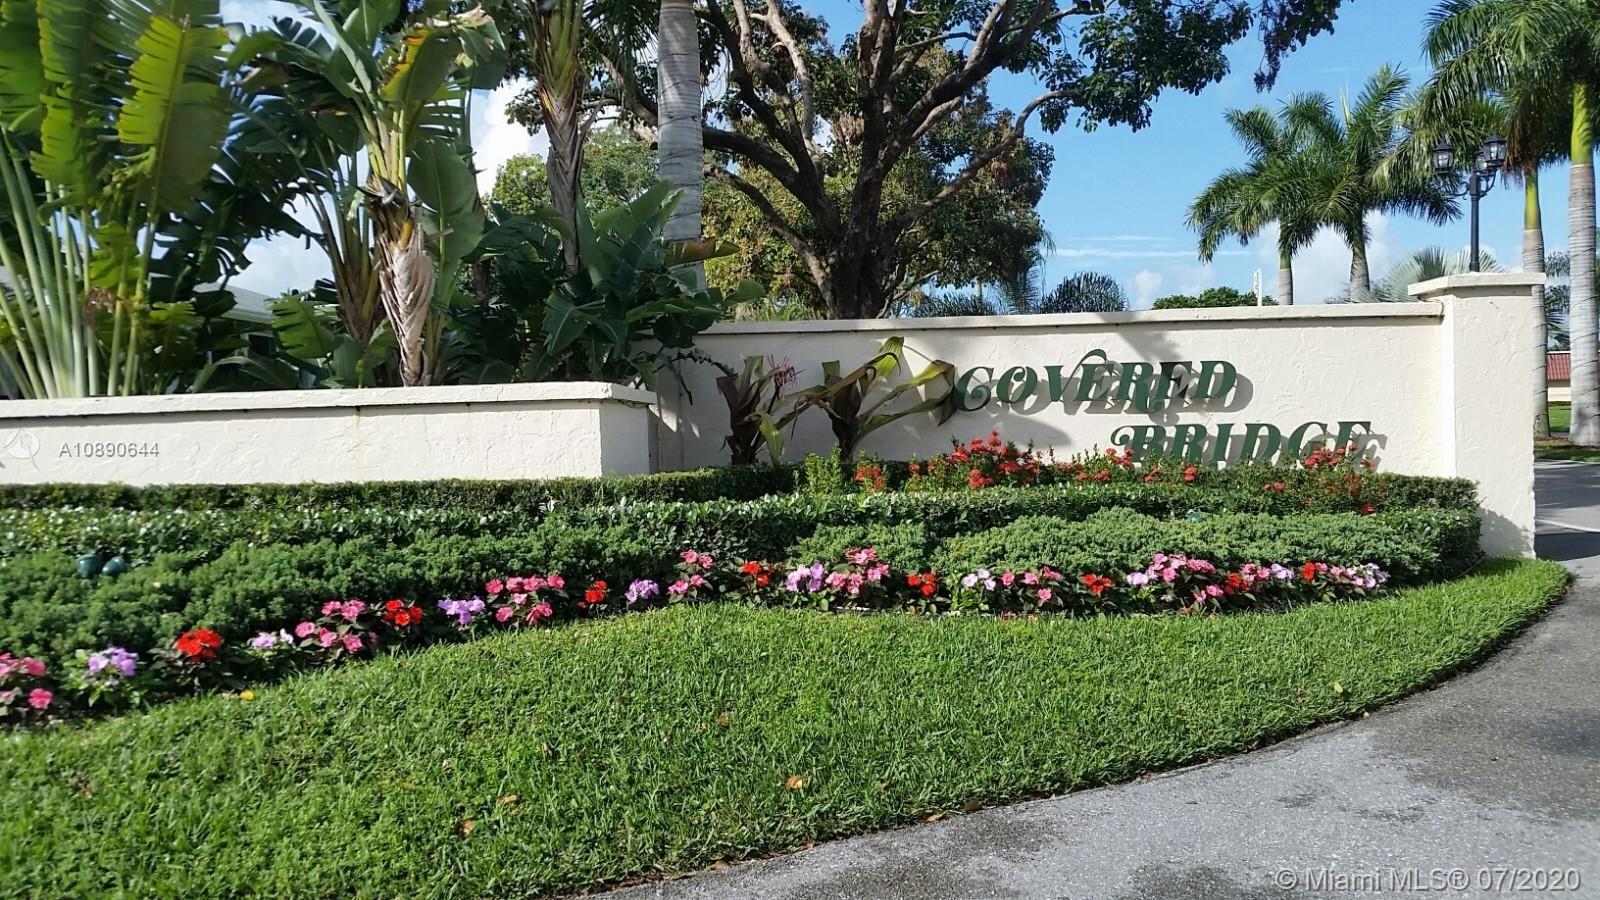 529 FRANCONIA CIRCLE #529, Lake Worth, FL 33467 - #: A10890644